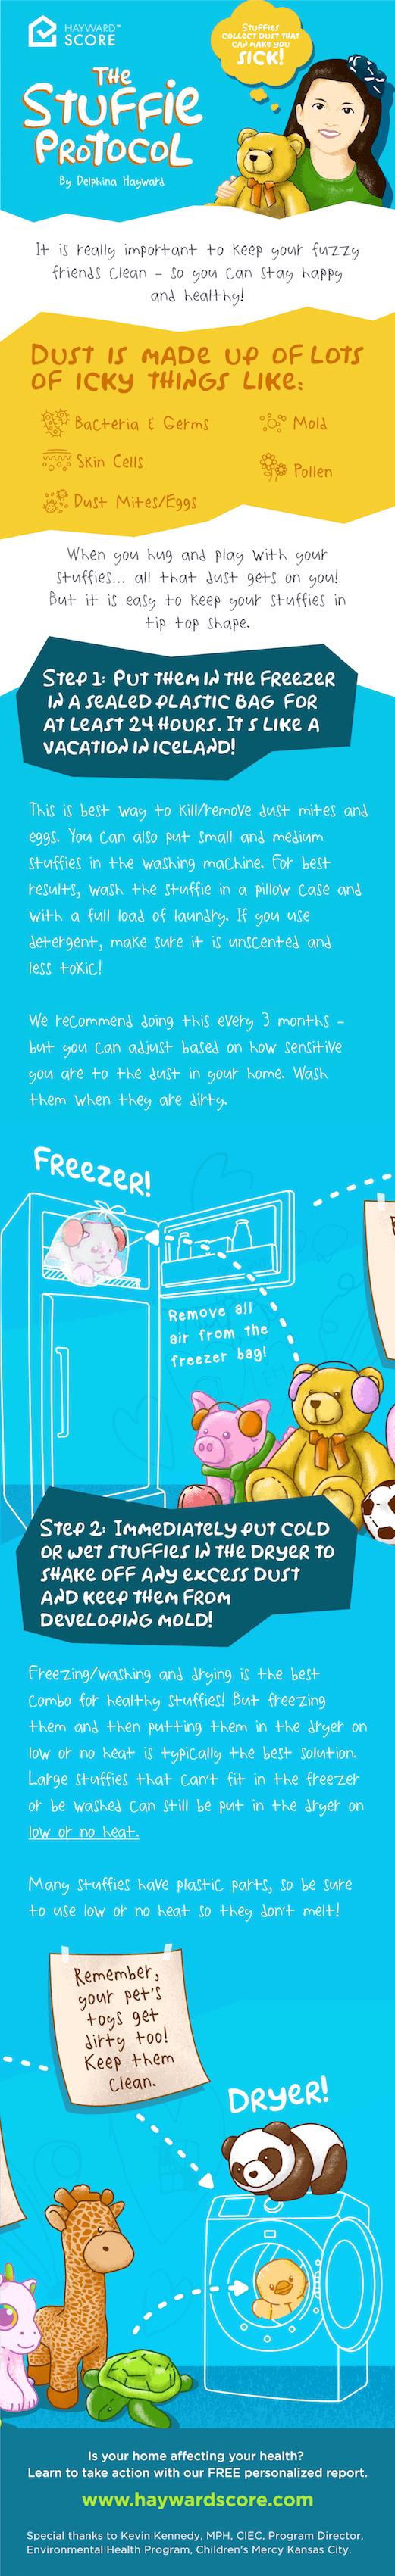 TThe Stuffie Protocol